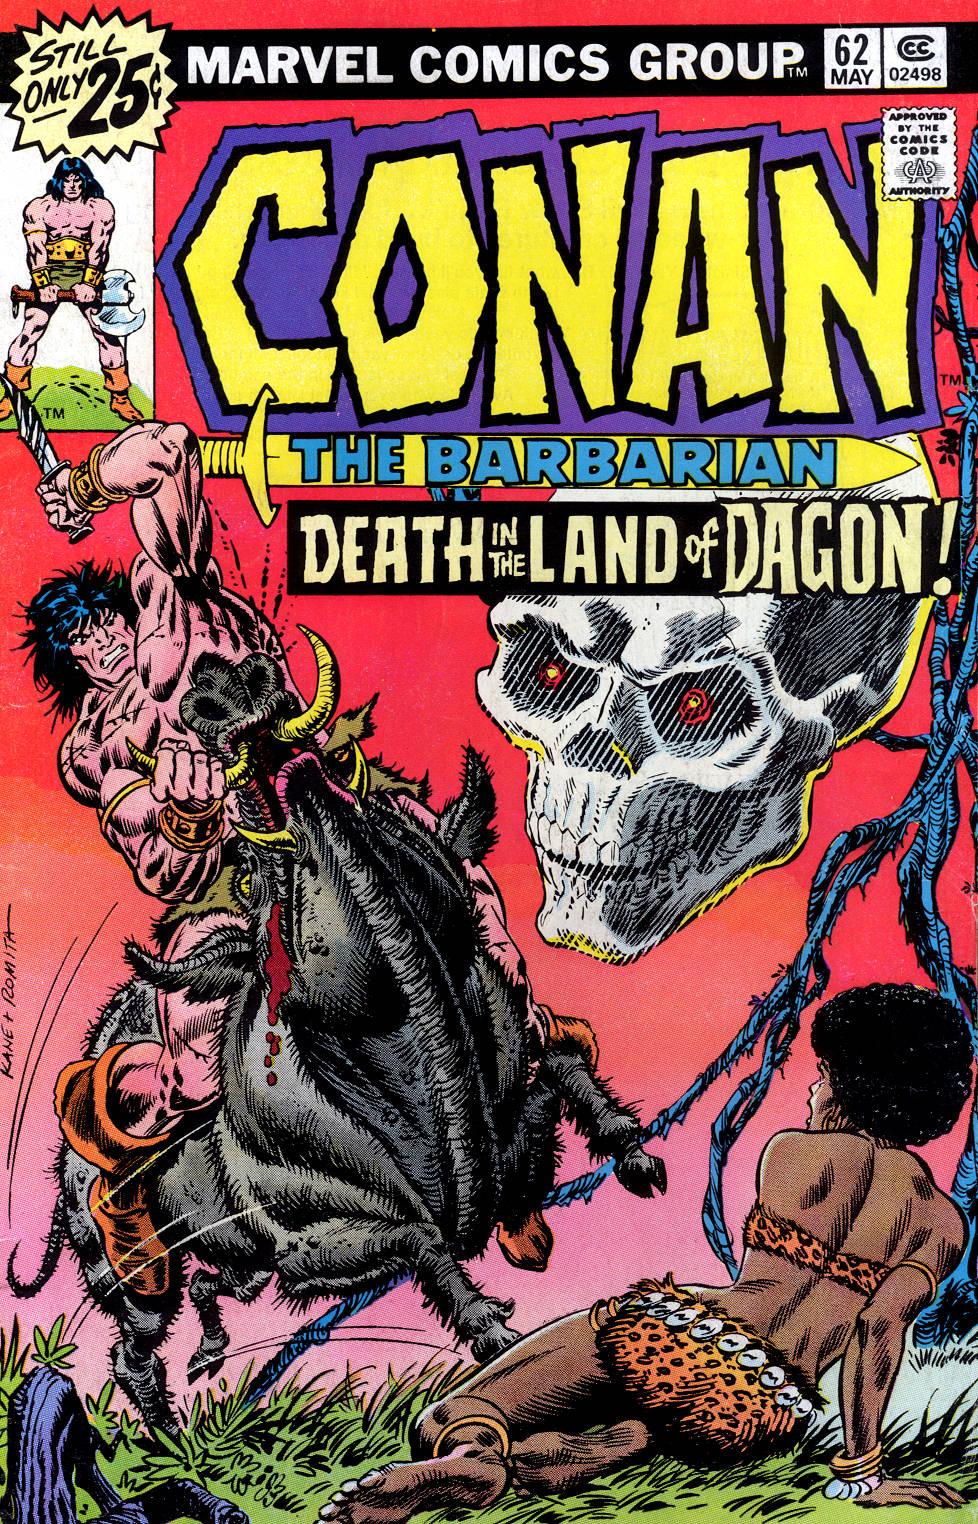 Conan the Barbarian (1970) Issue #62 #74 - English 1